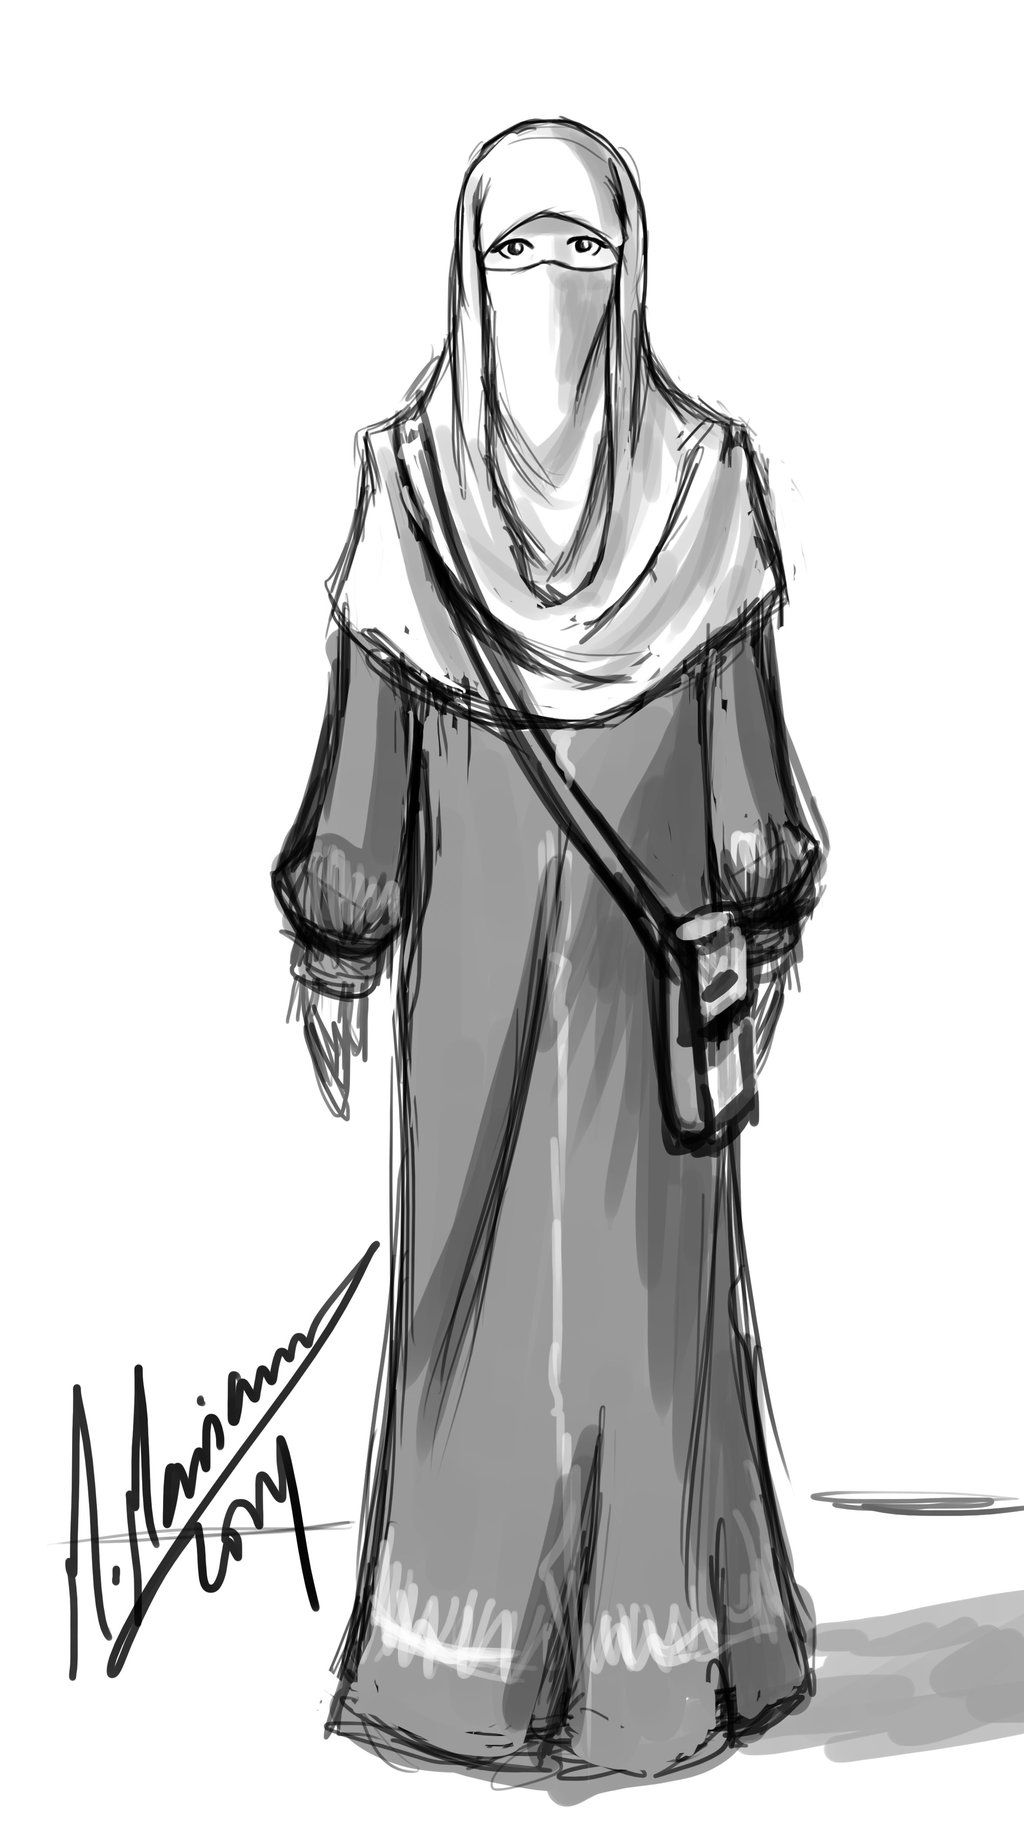 Niqabi Sketch By Madimar.deviantart.com On @deviantART   Muslim Anime   Pinterest   Sketches ...